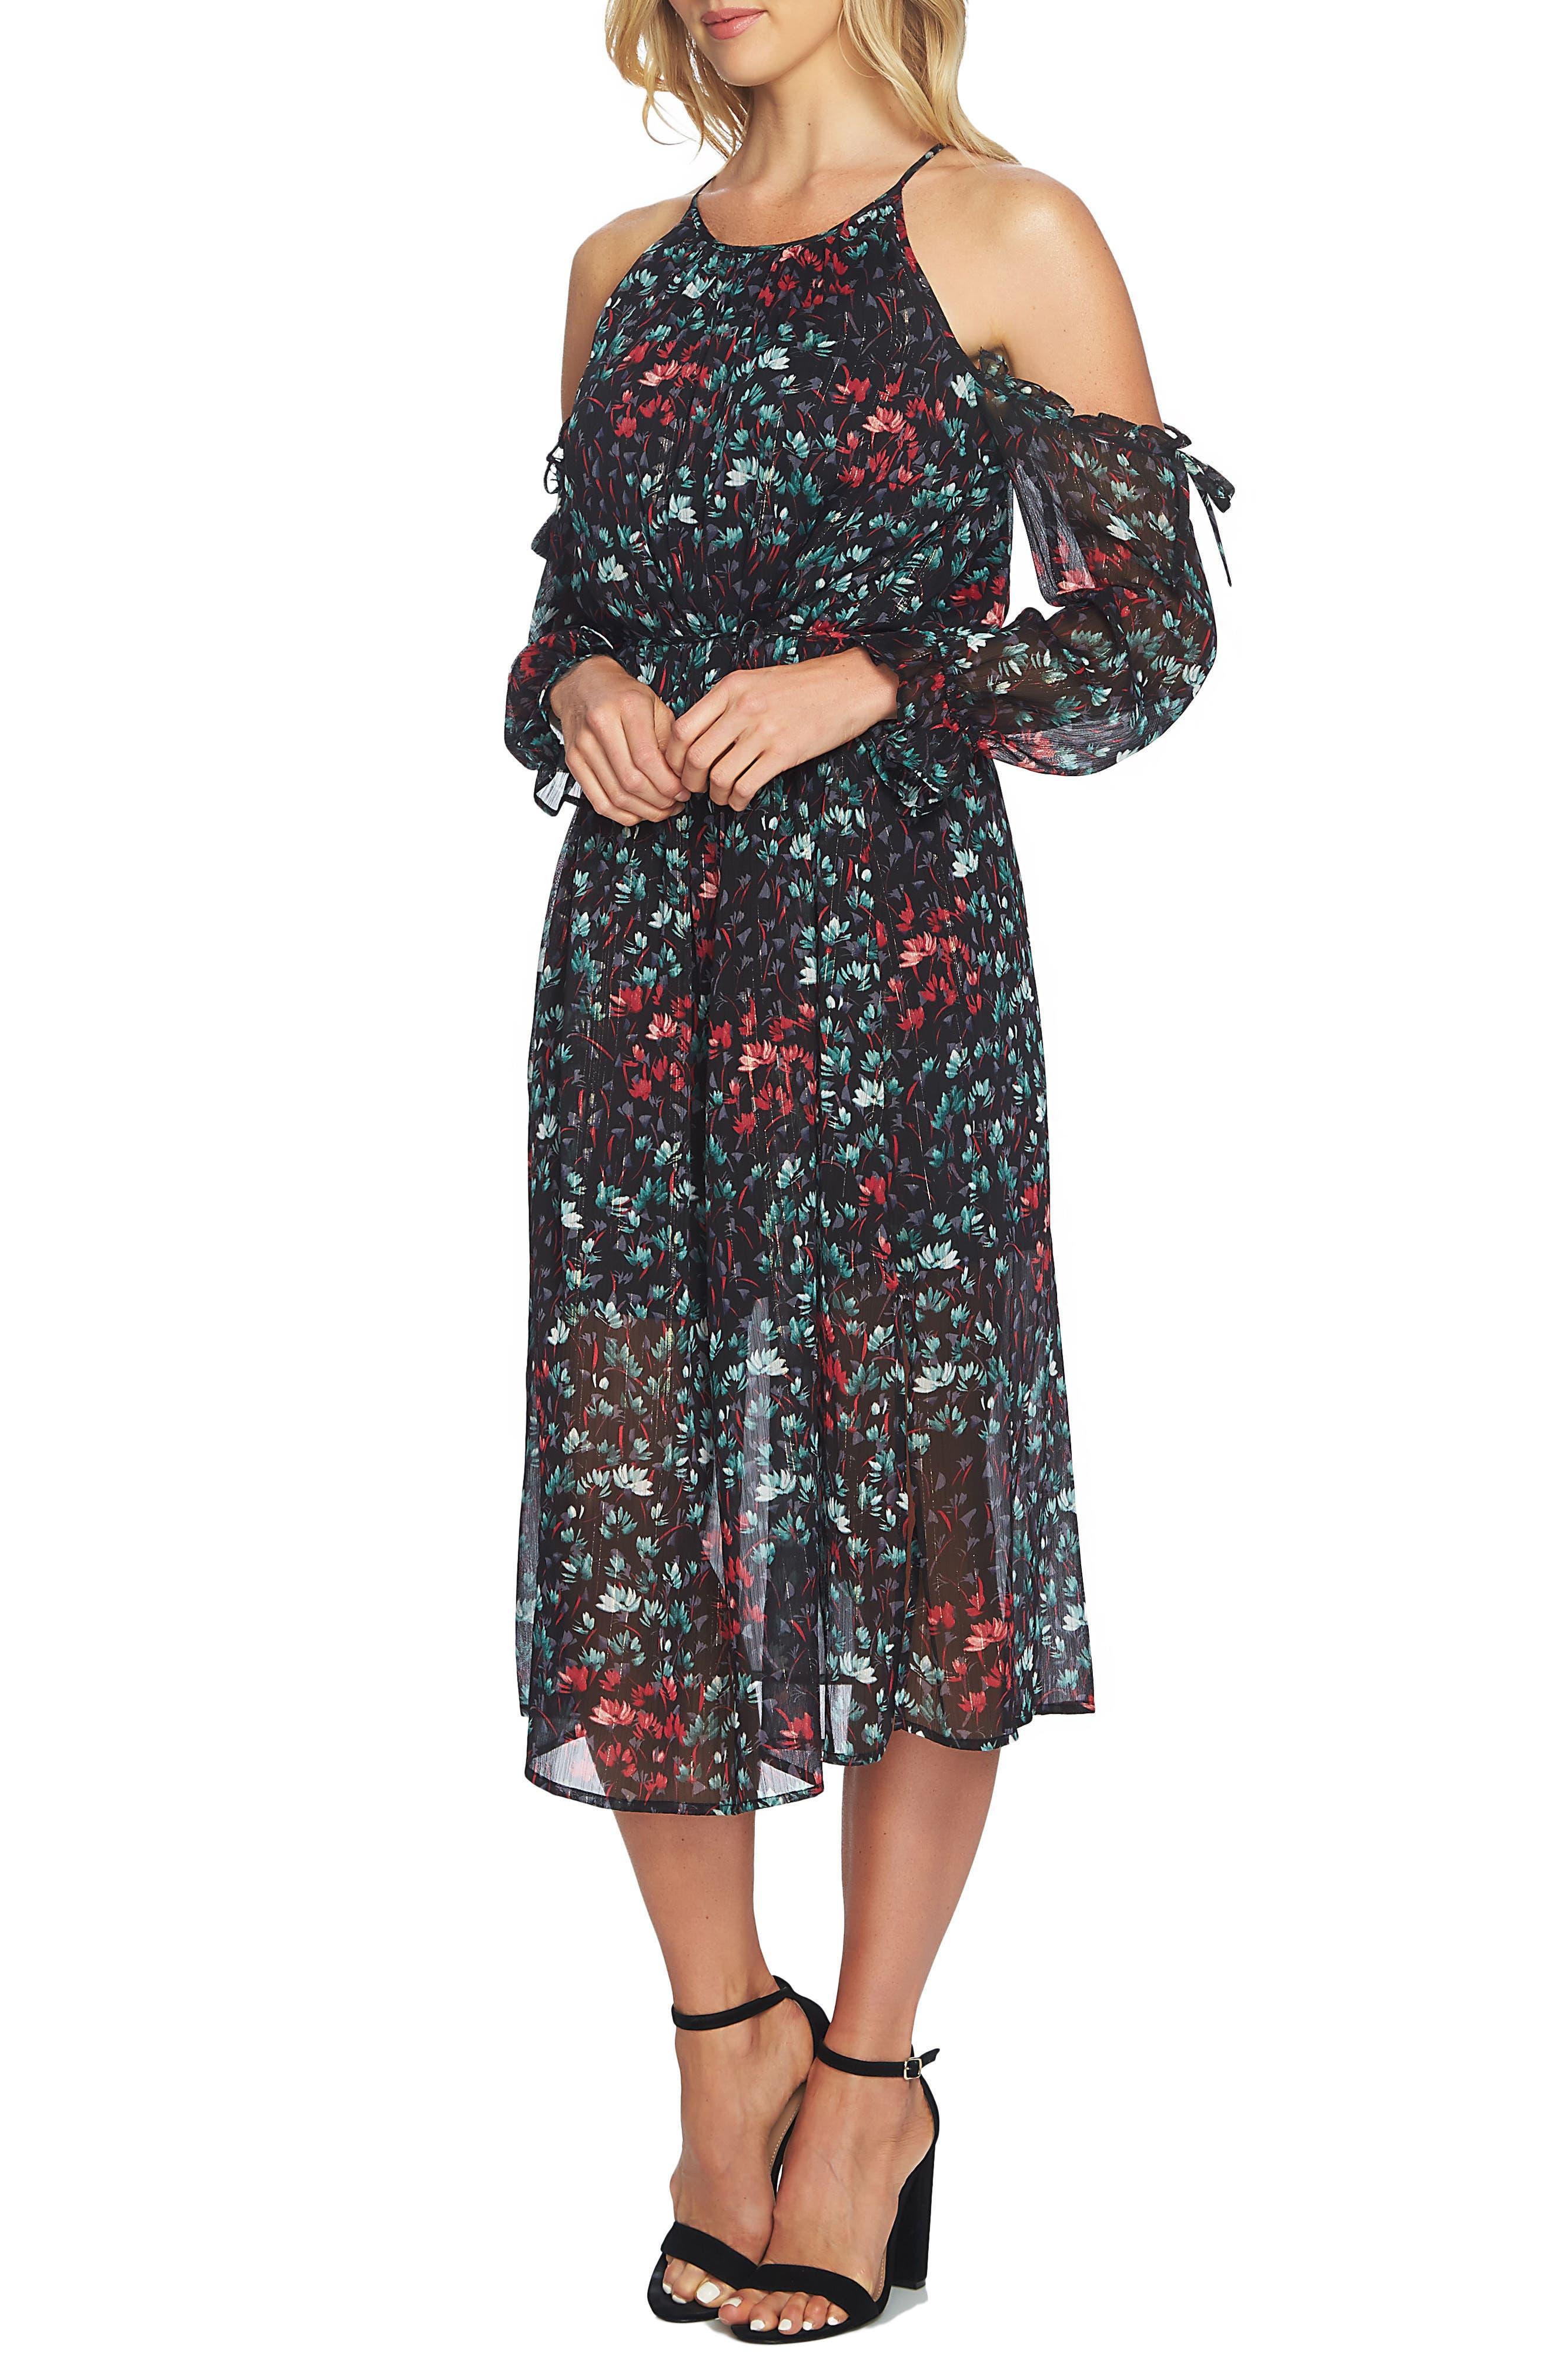 Main Image - 1.STATE Cold Shoulder Midi Dress